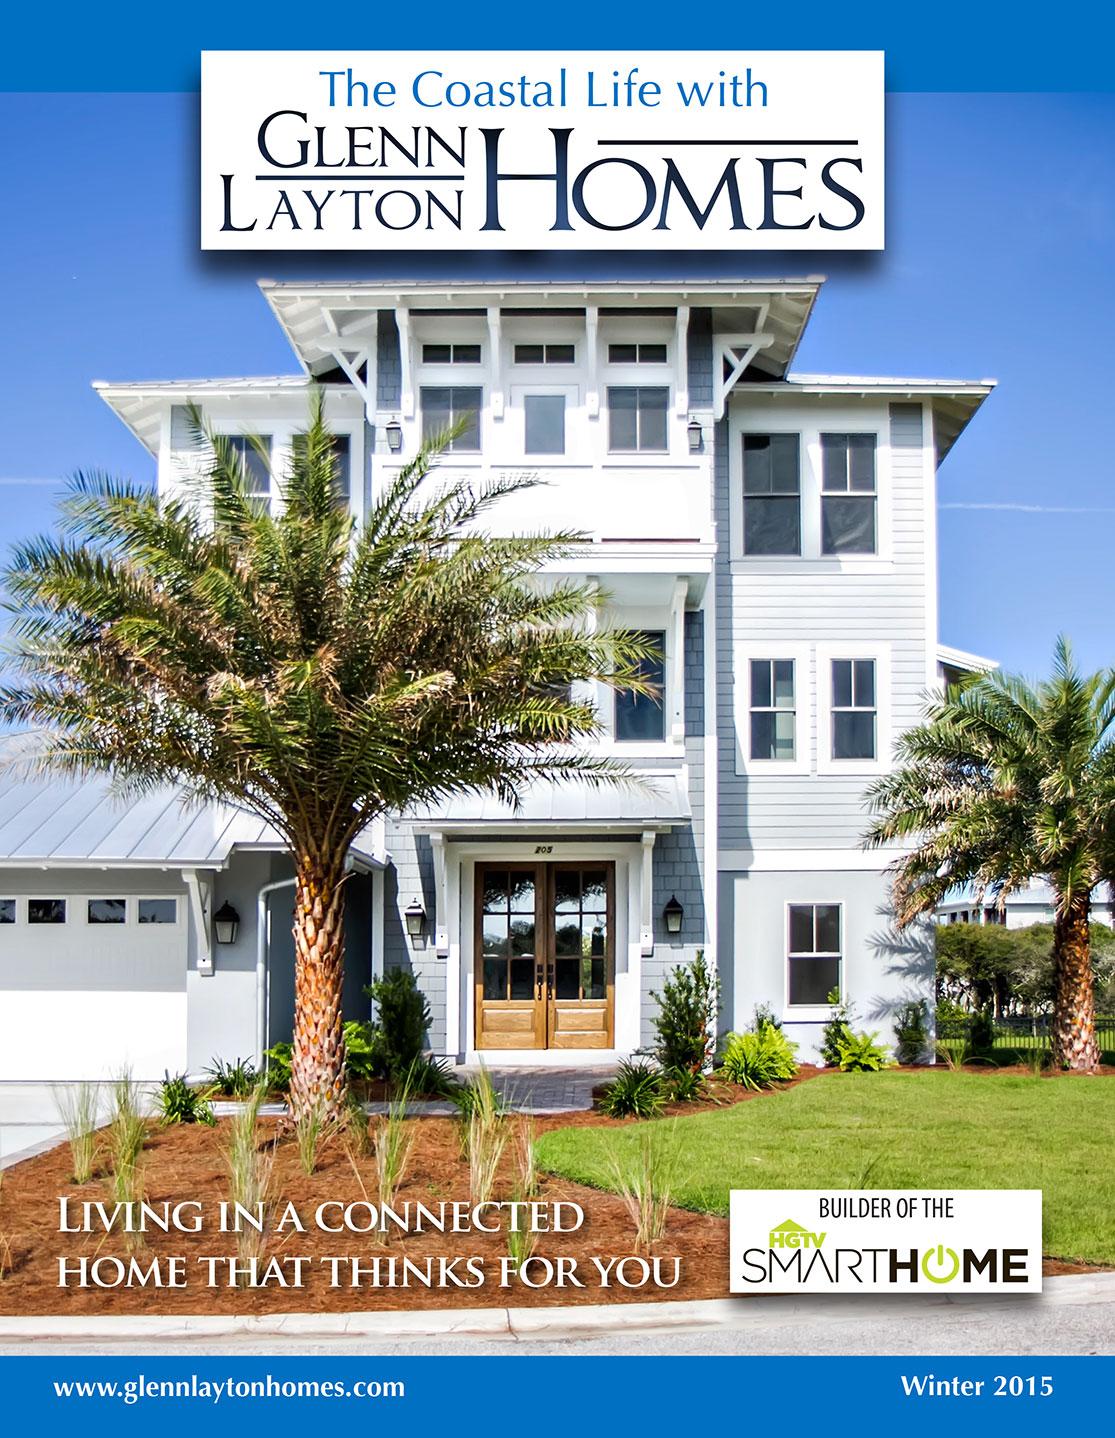 The Coastal Life Magazine - Glenn Layton Homes